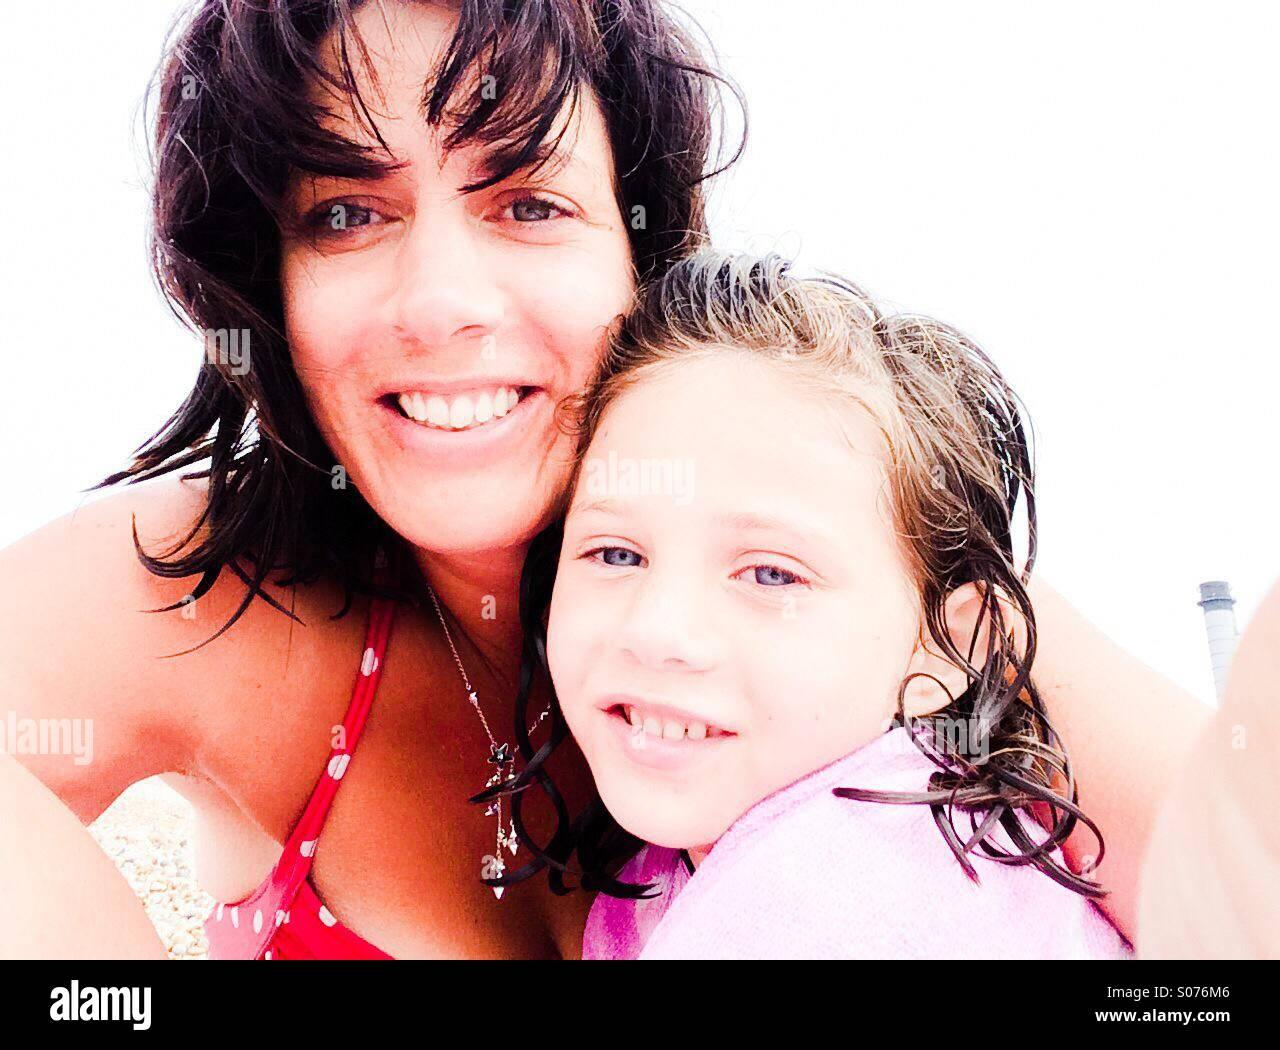 Madre e hija selfie Imagen De Stock